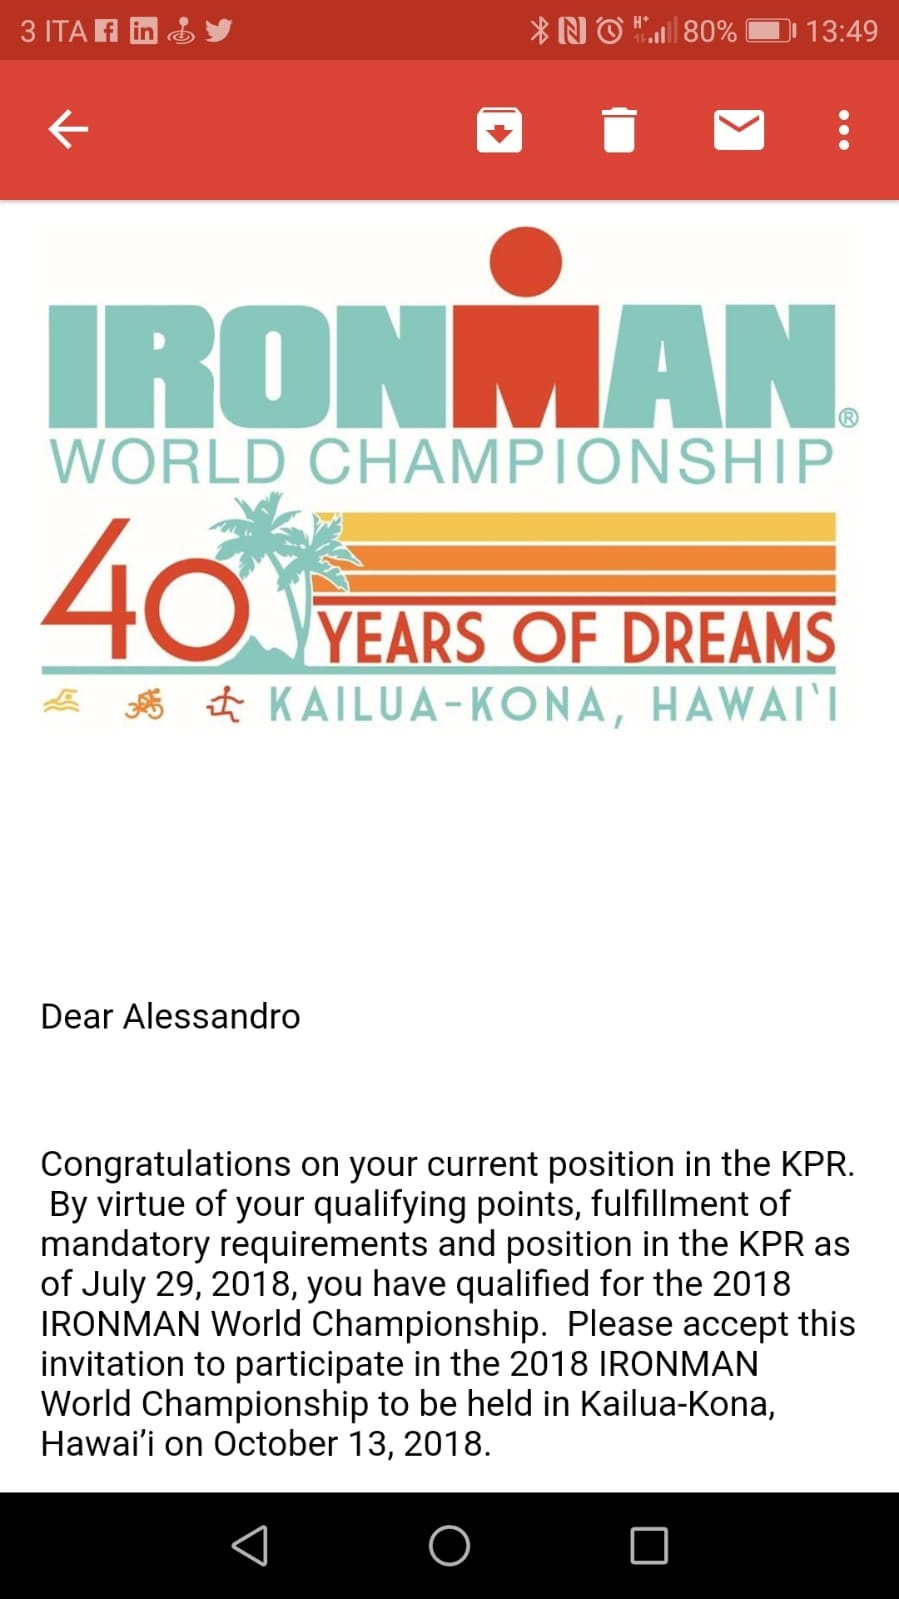 Alessandro_Degasperi | Ironman_World Championship | Kailua_Kona